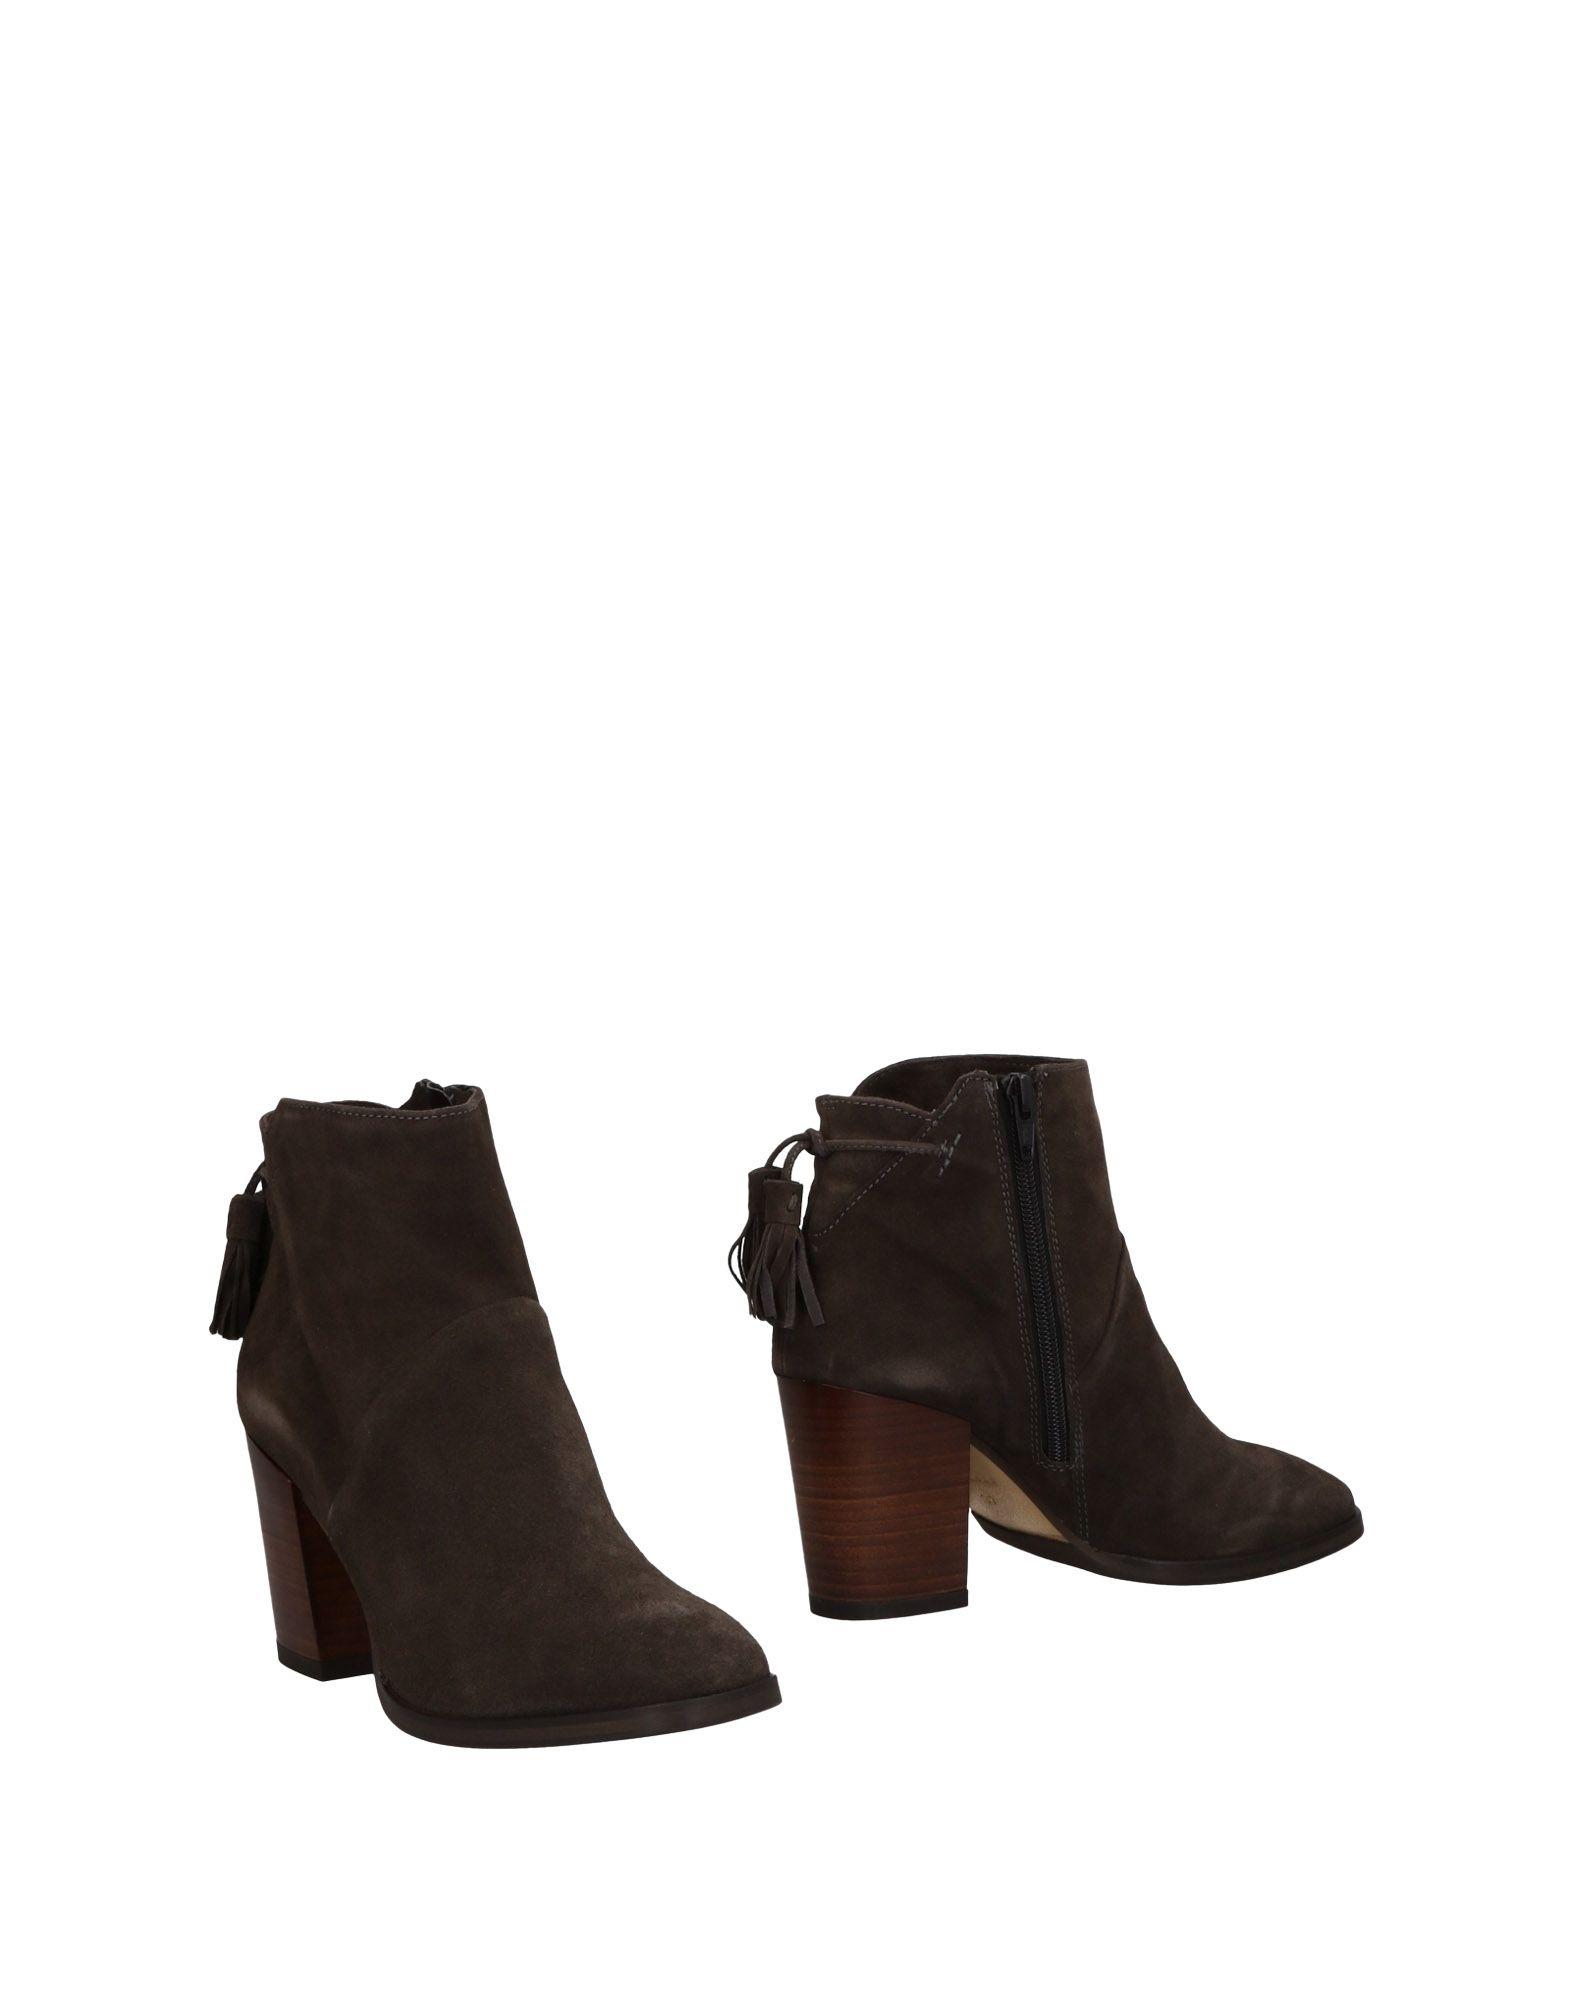 Carmens Stiefelette Damen  11472507QB Gute Qualität beliebte Schuhe